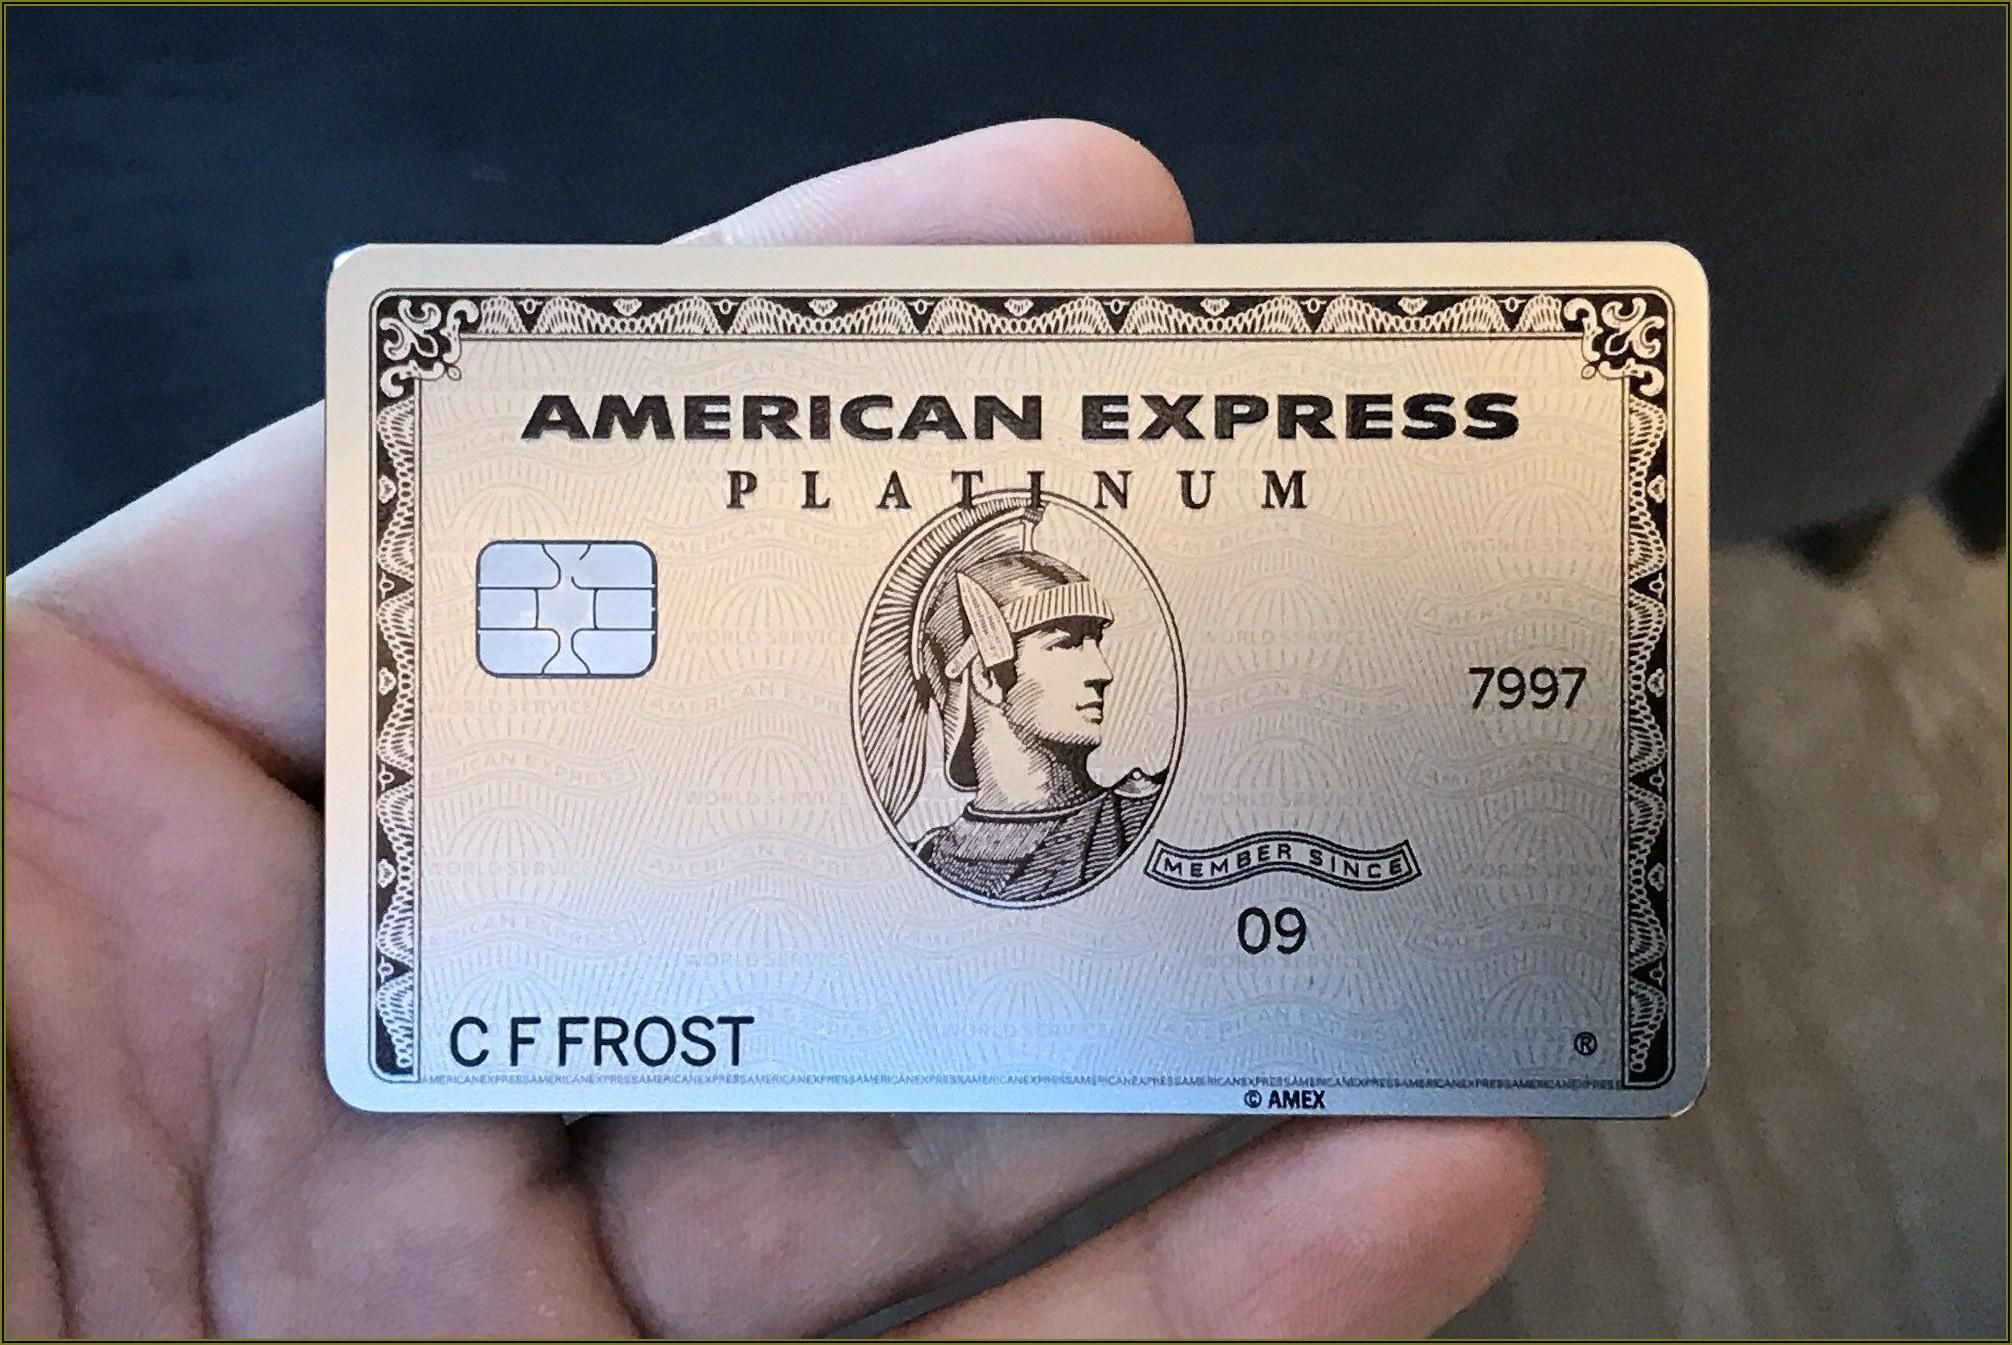 Amex Platinum Business Employee Card Benefits